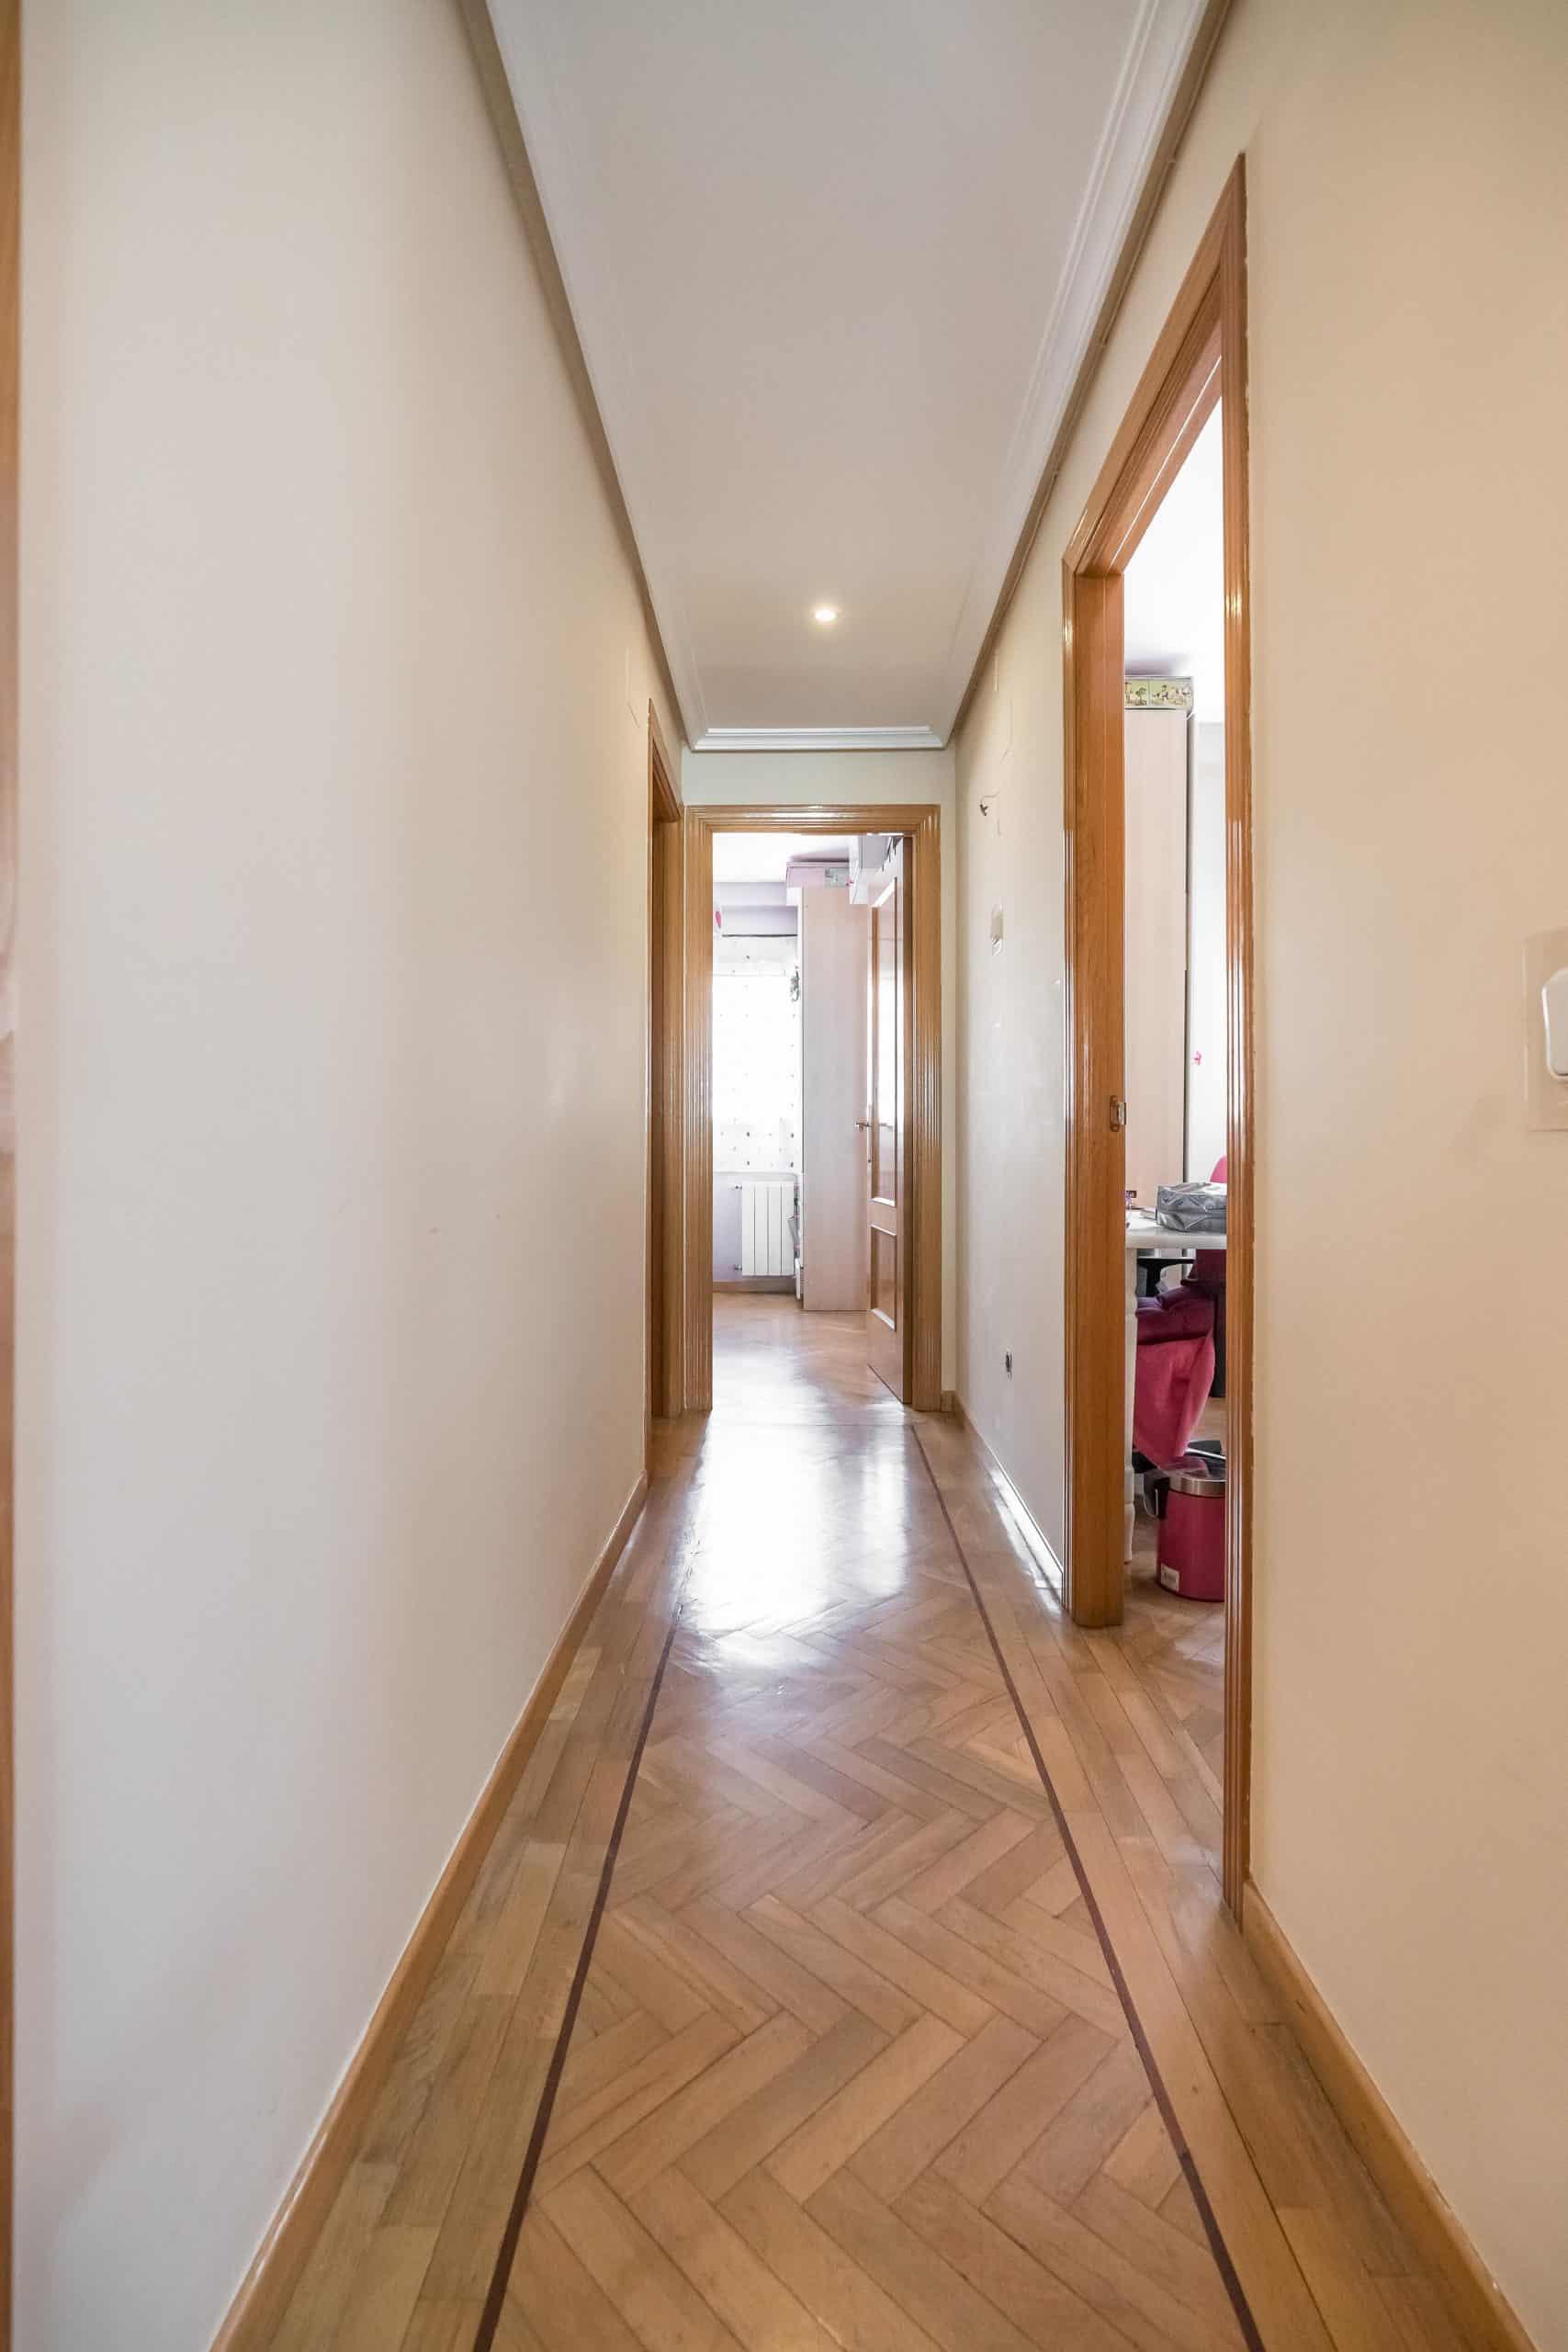 Agencia Inmobiliaria de Madrid-FUTUROCASA-Zona ARGANZUELA-EMBAJADORES-LEGAZPI1 ENTRADA PASILLO(3)